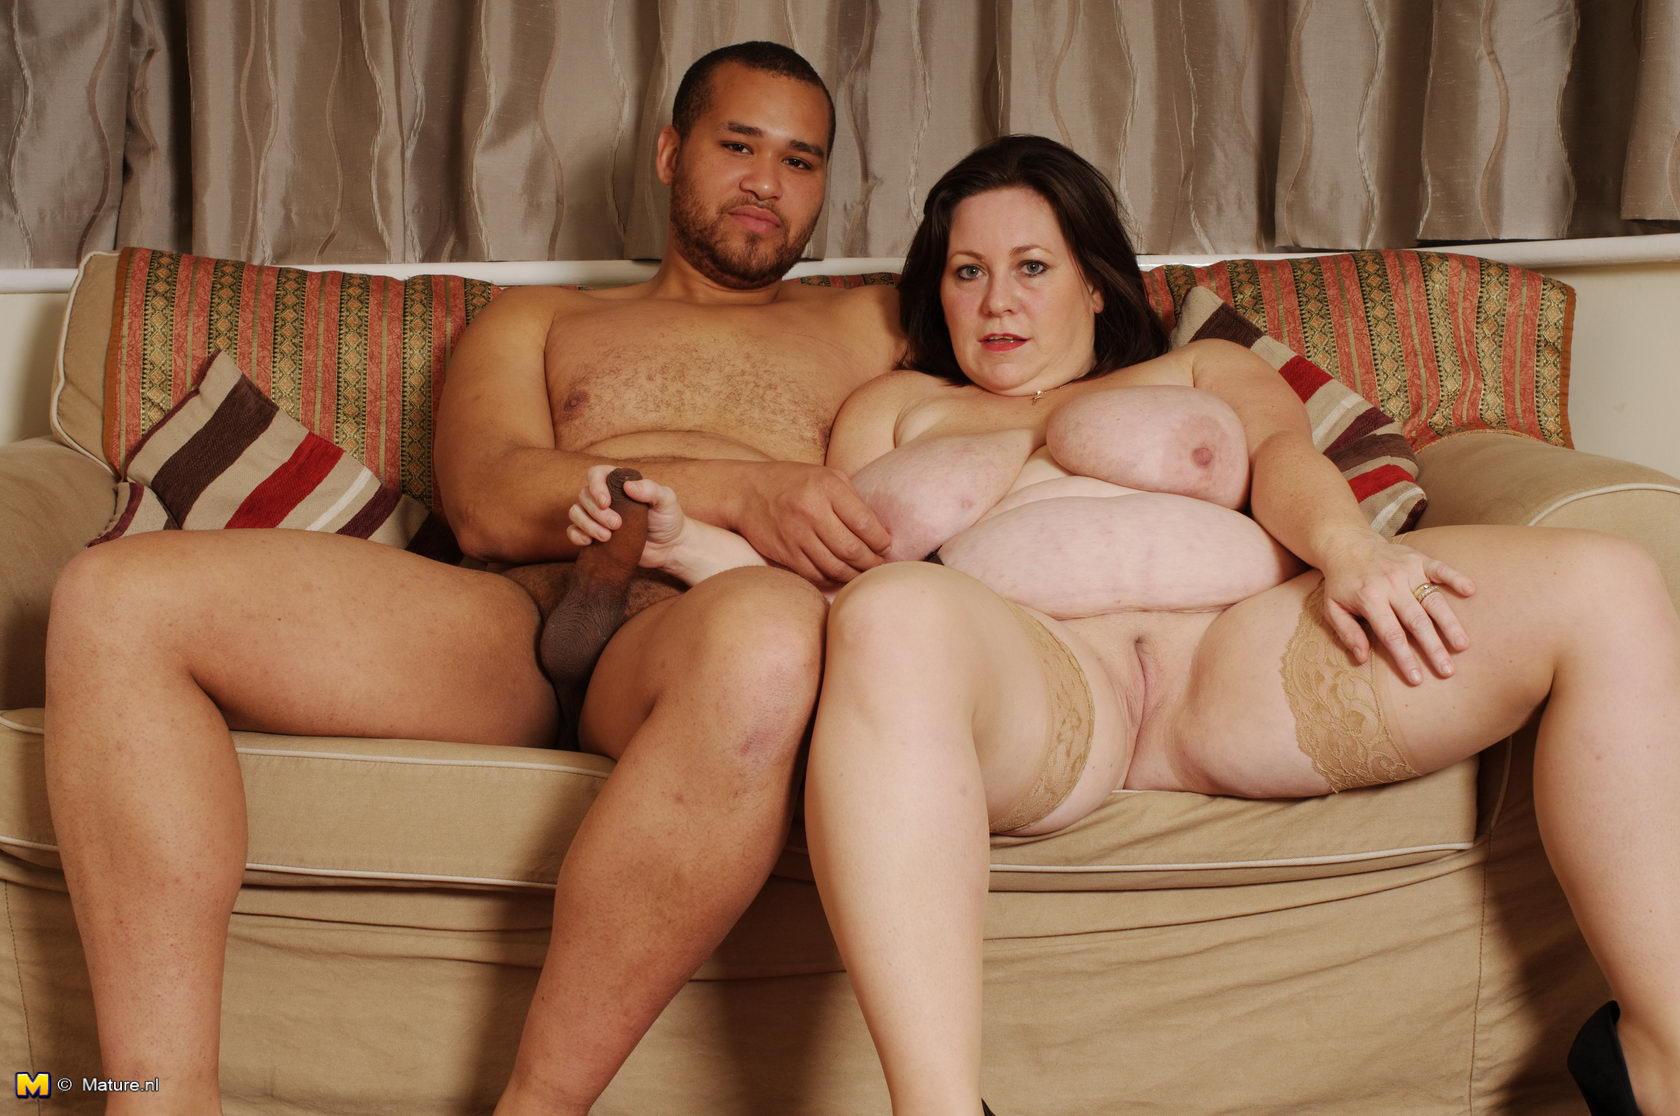 Секс зрелые мамки онлайн 19 фотография